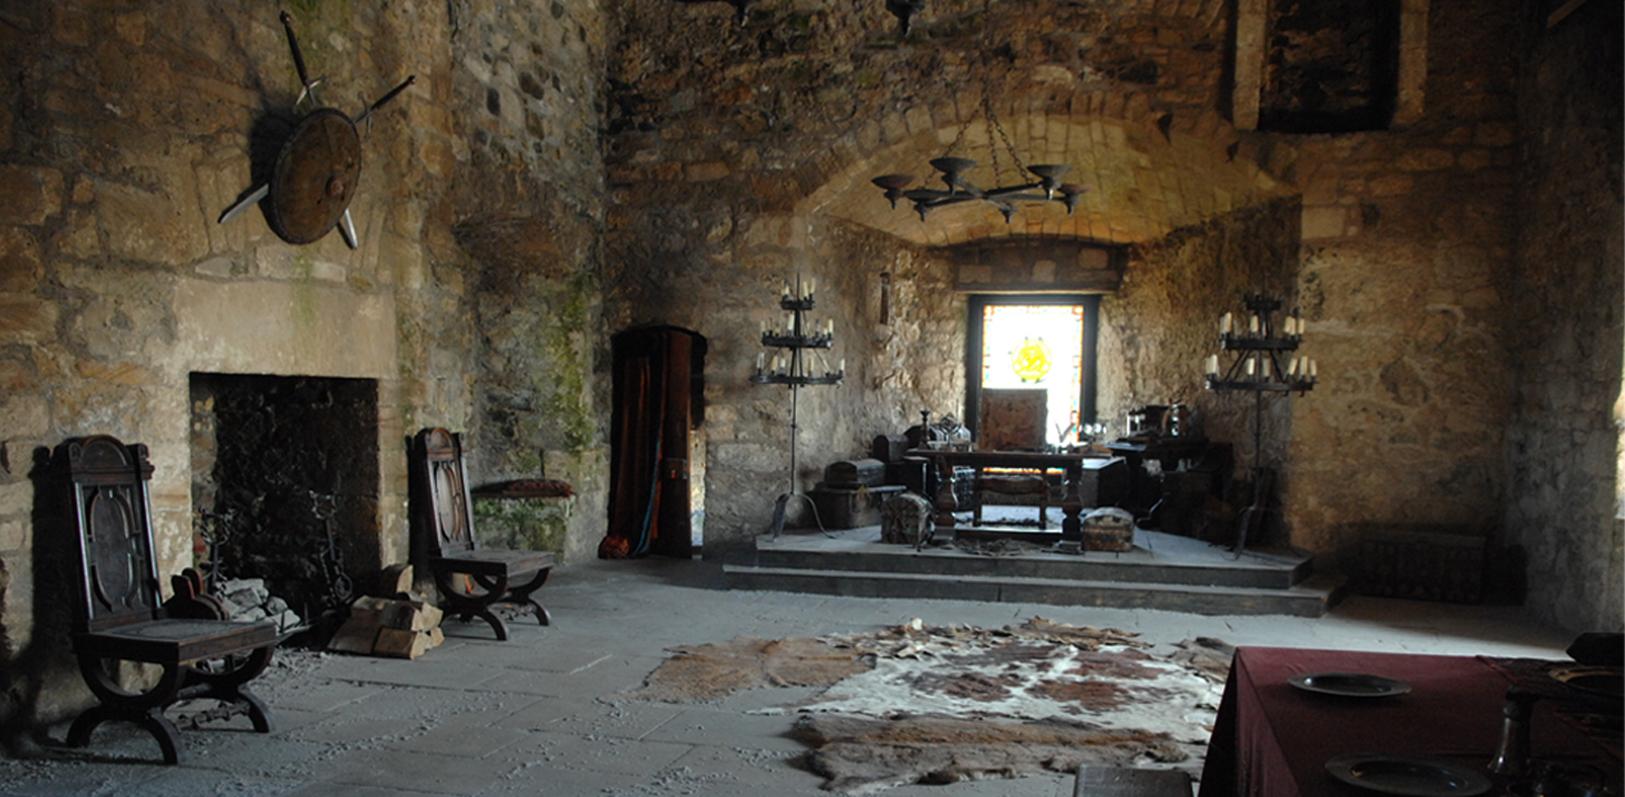 Interior throne room set.